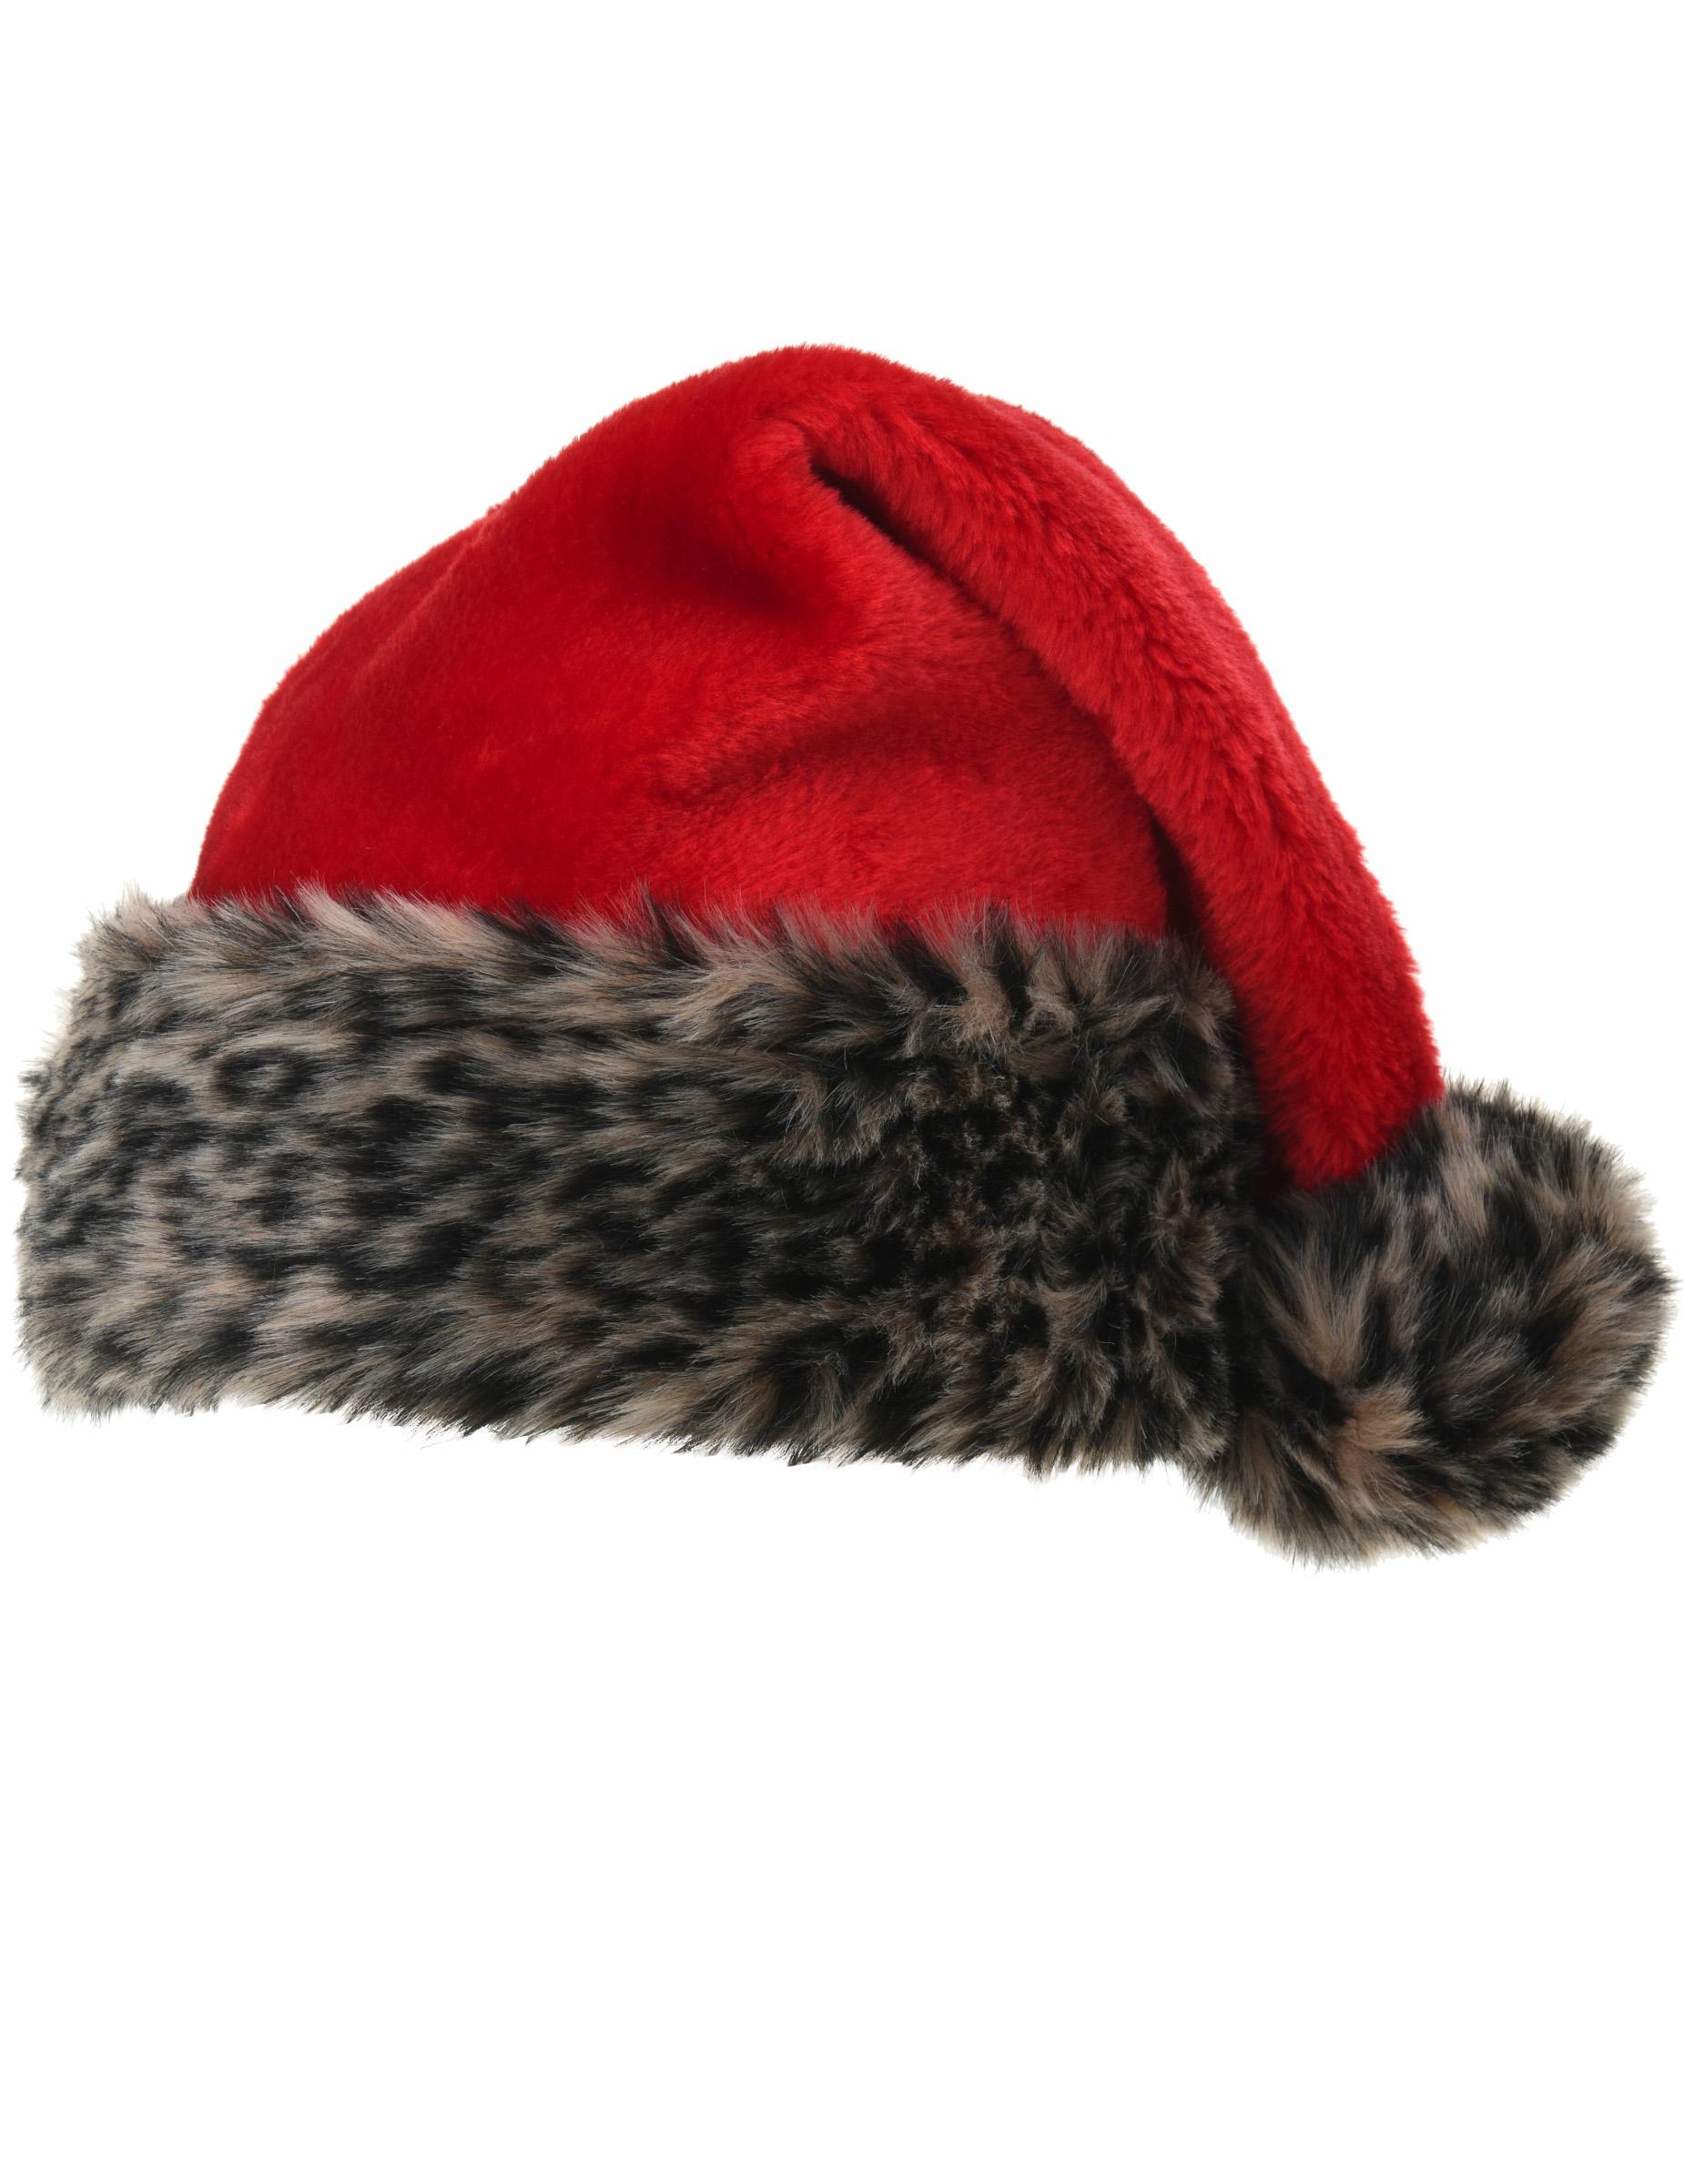 Chapéus Pai Natal para disfarces e festas de aniversário - Vegaoo.pt 5854ef96dac